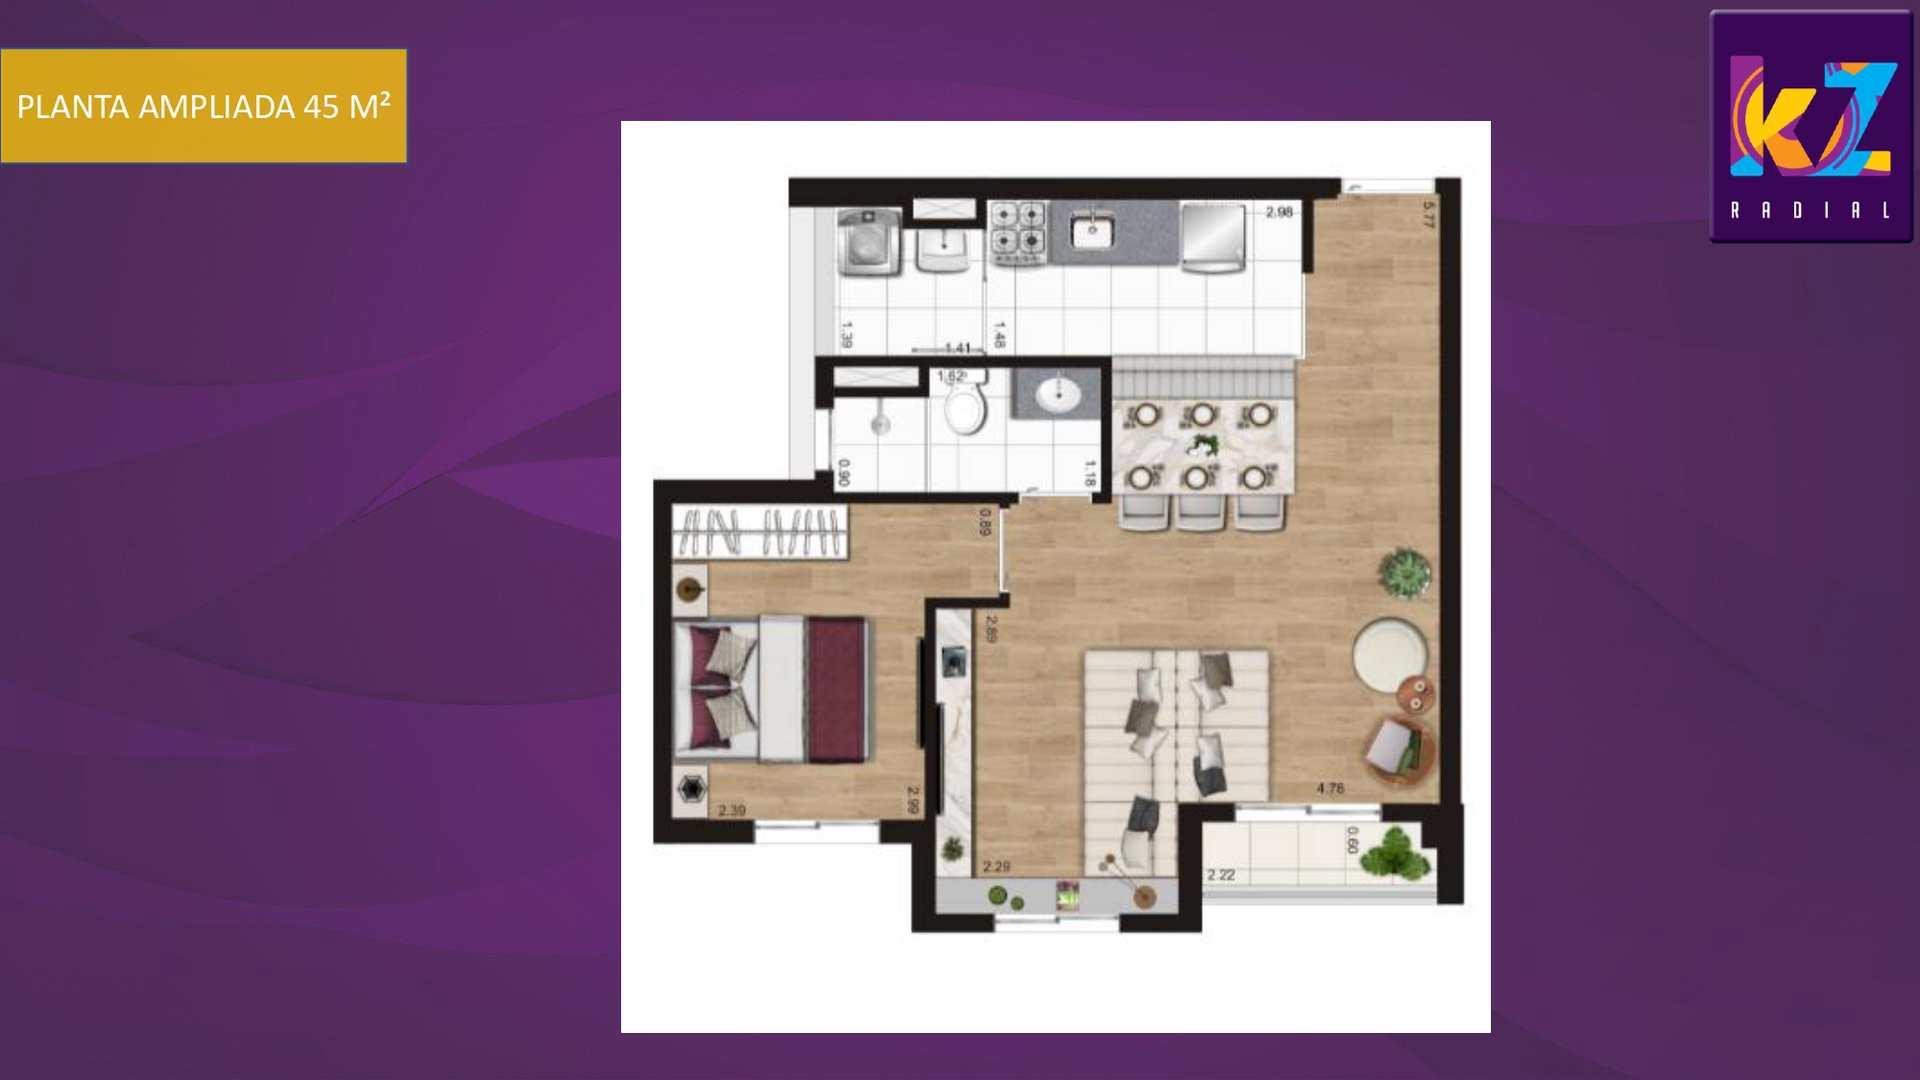 Planta 45 m² - Ampl.